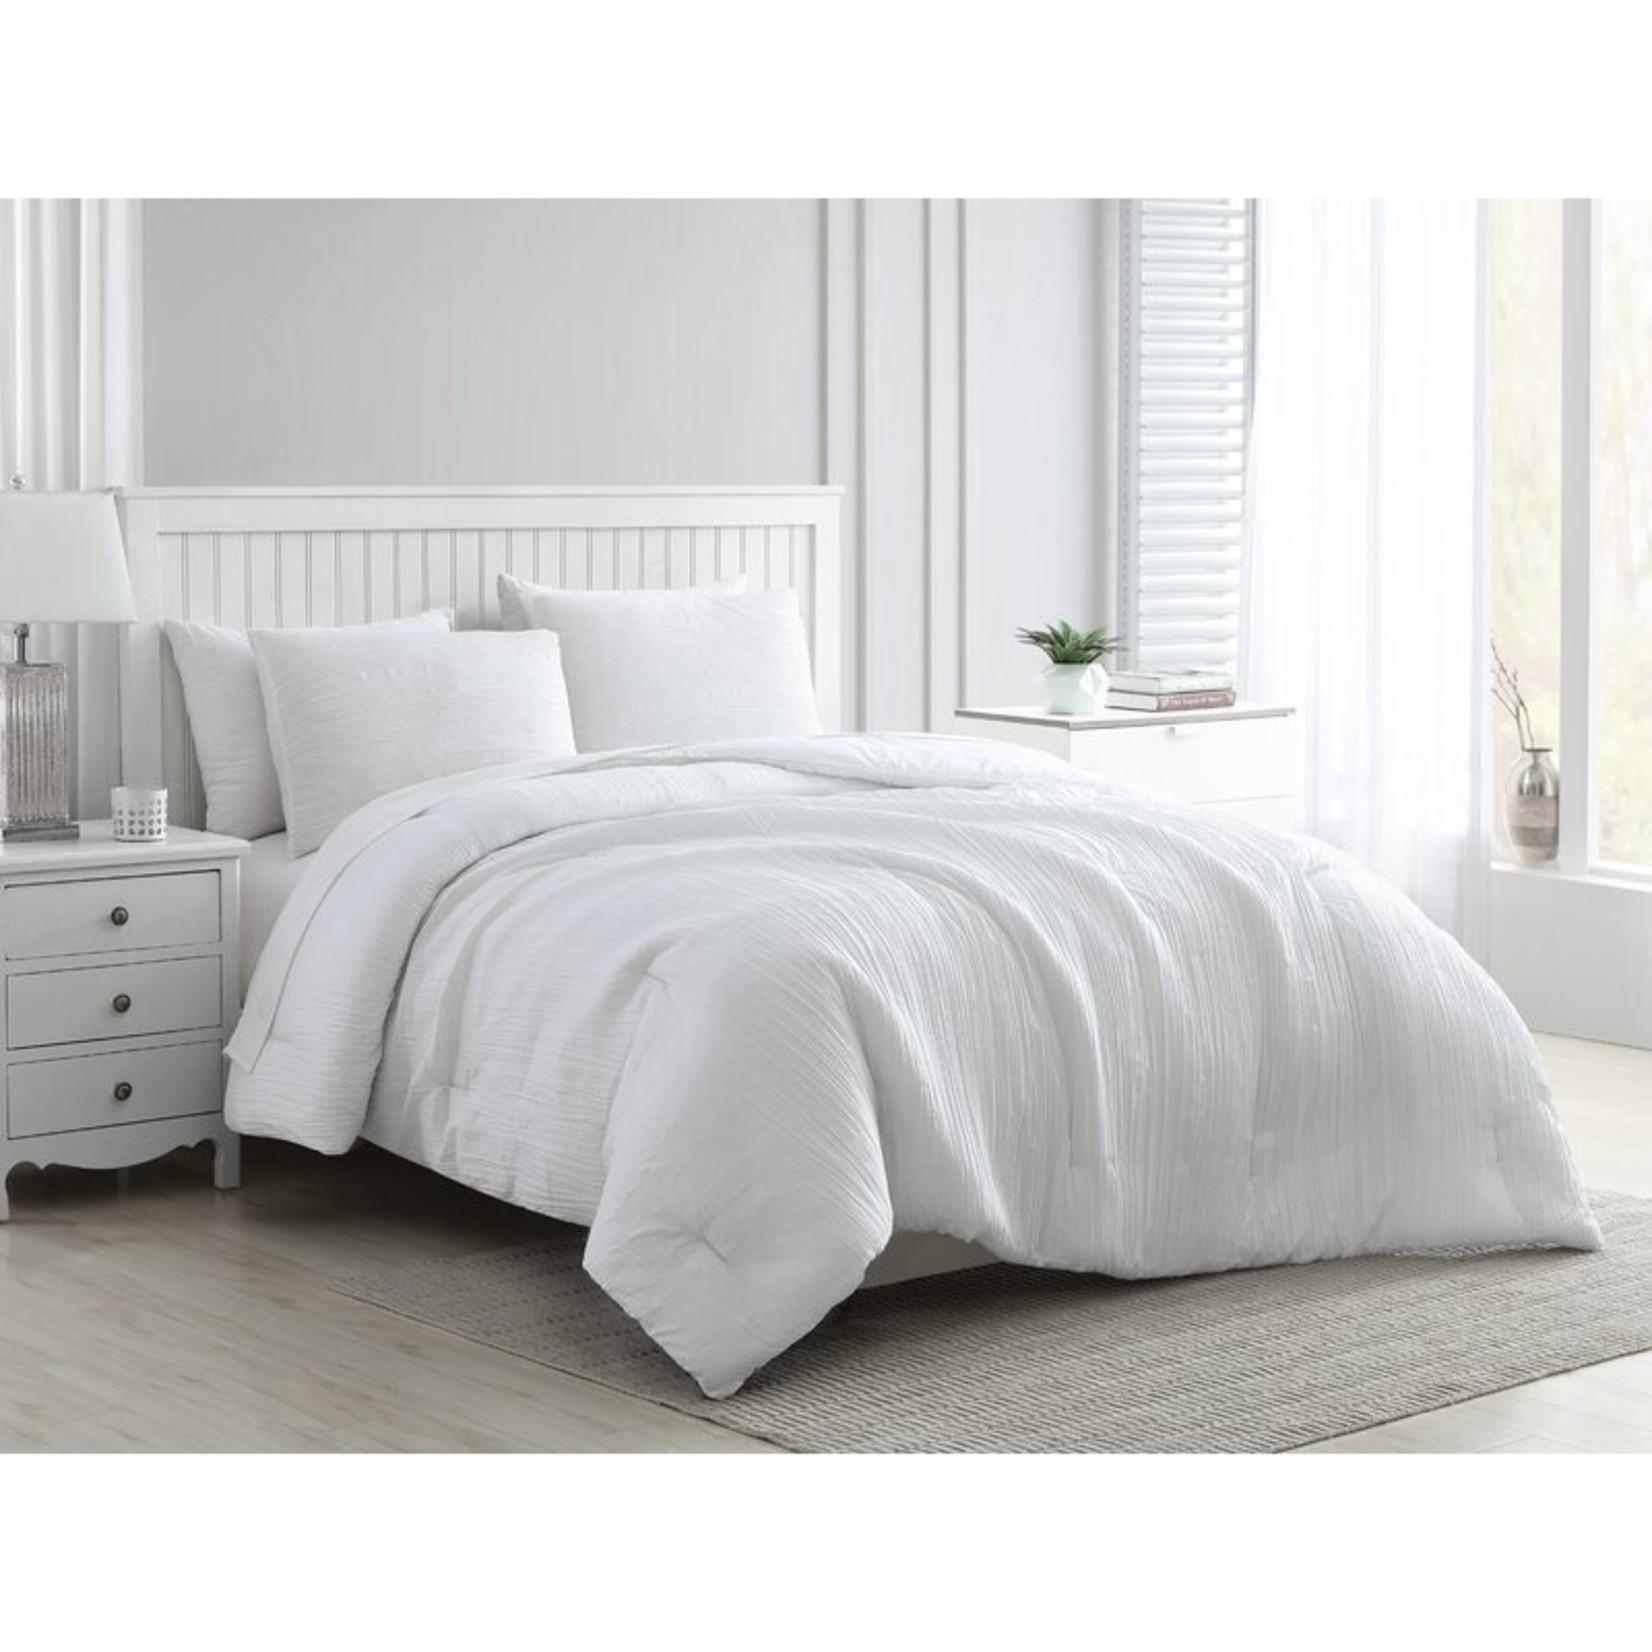 *Queen - Azime Greenport Crinkle 3-Piece Comforter Set In Wedgewood - White - Final Sale